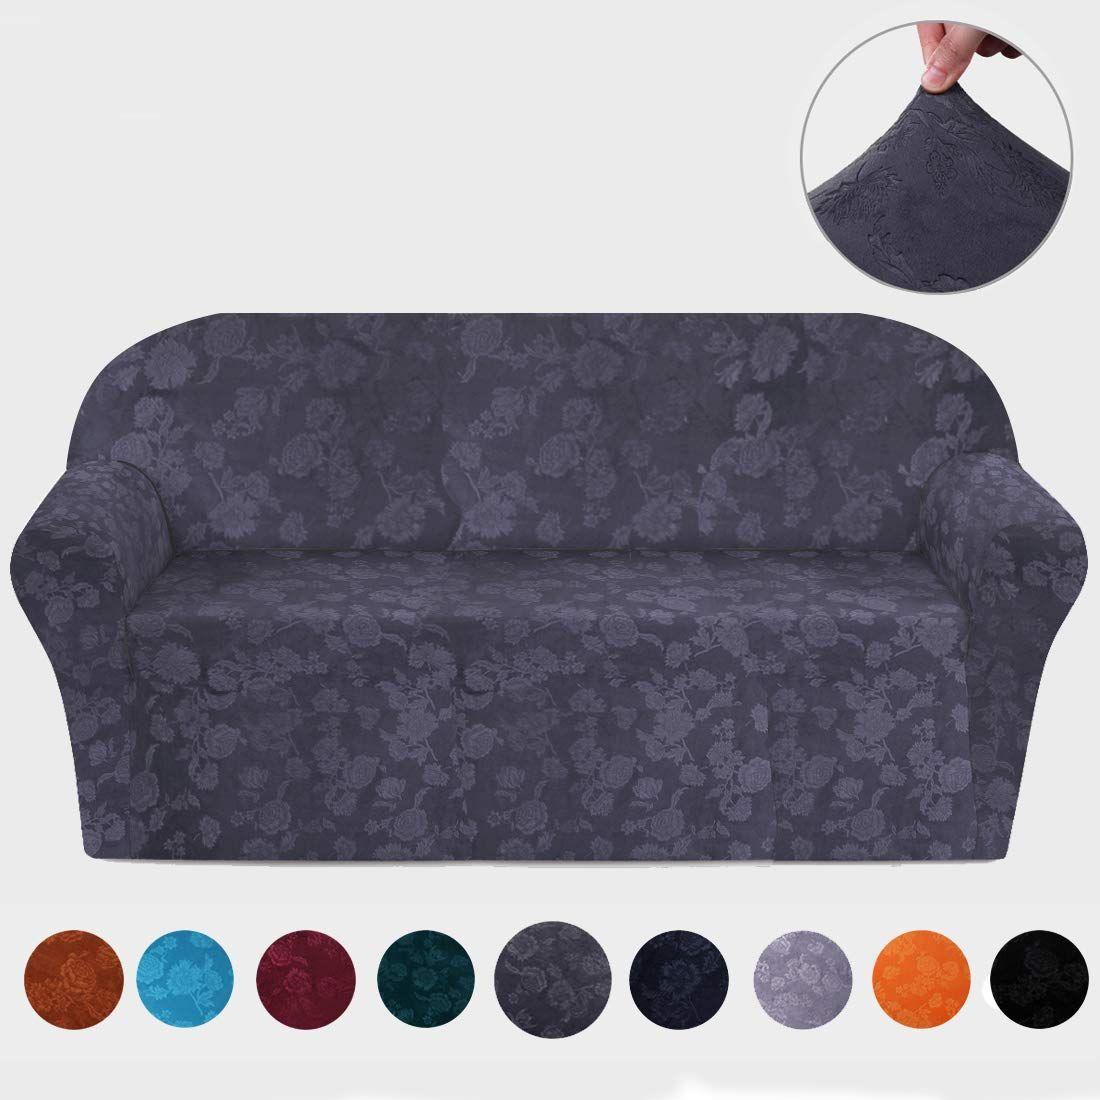 Amazon Com Misaya Stretch Sofa Cover Soft Non Slip Furniture